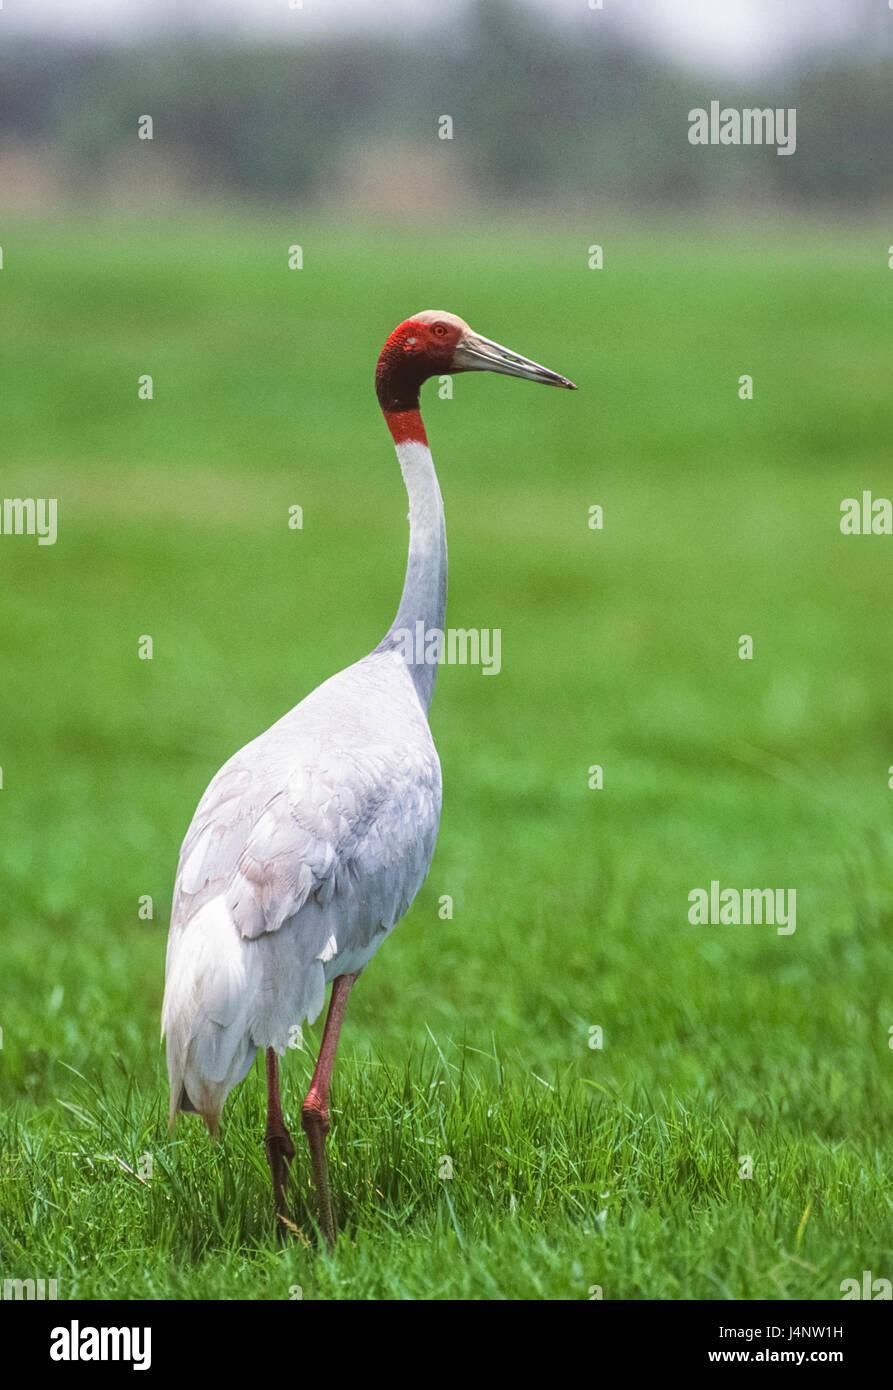 adult Sarus Crane, Antigone antigone, Keoladeo Ghana National Park, Bharatpur, Rajasthan, India - Stock Image